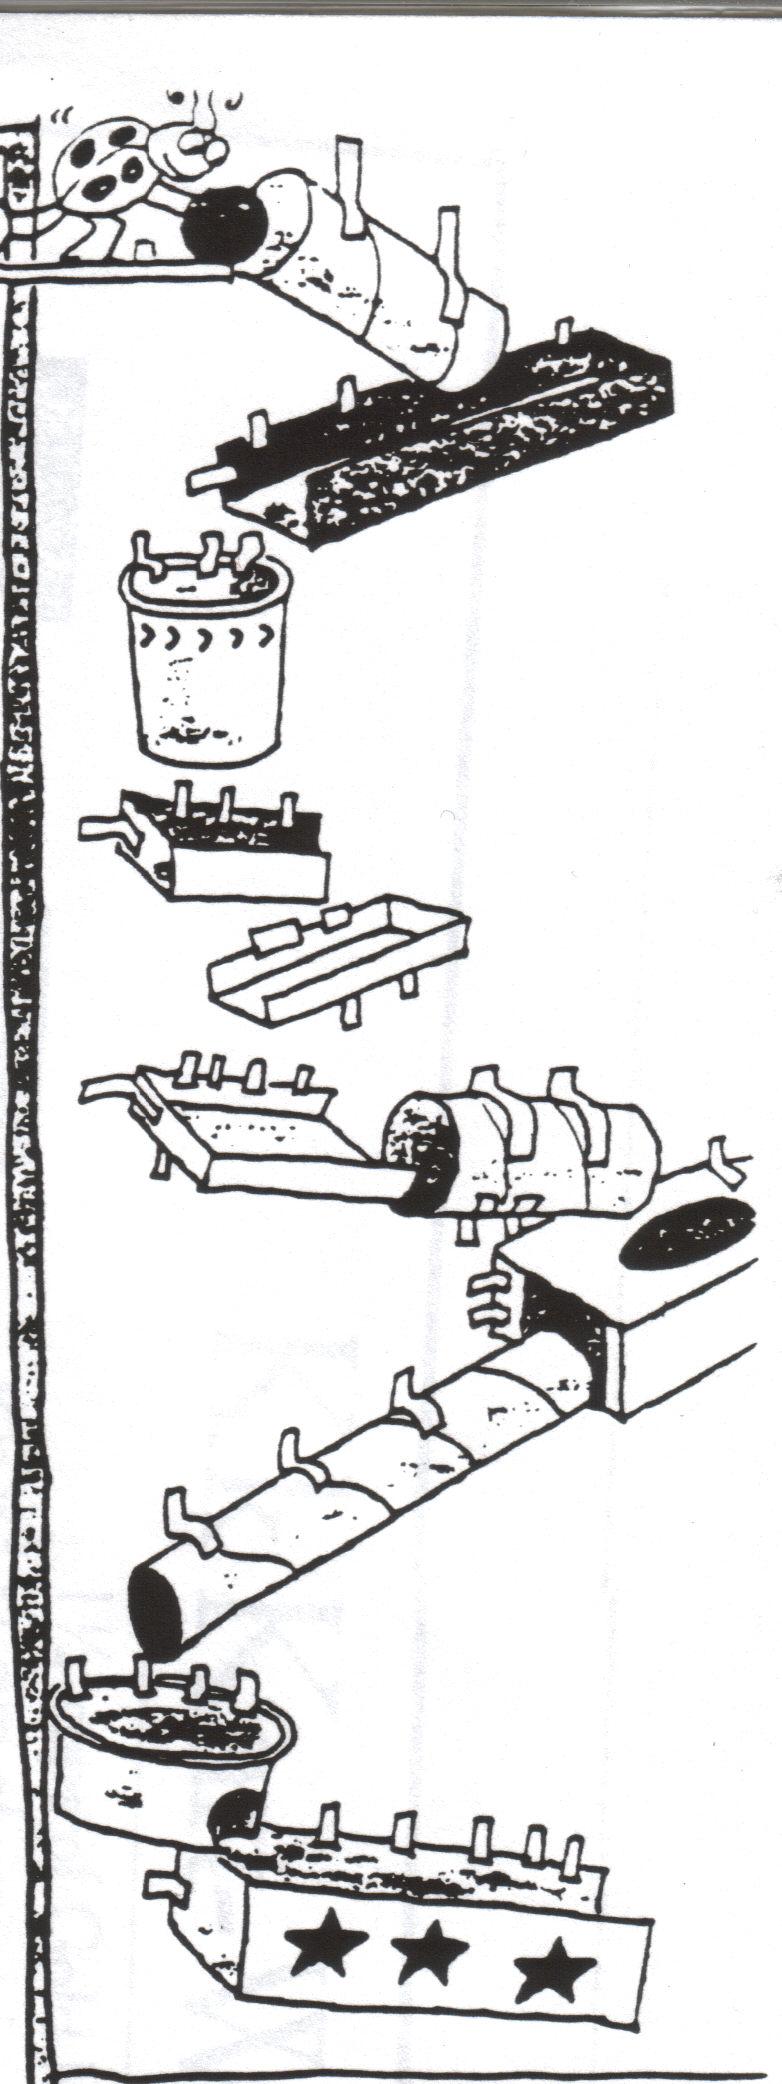 USSSP: Baloo's Bugle